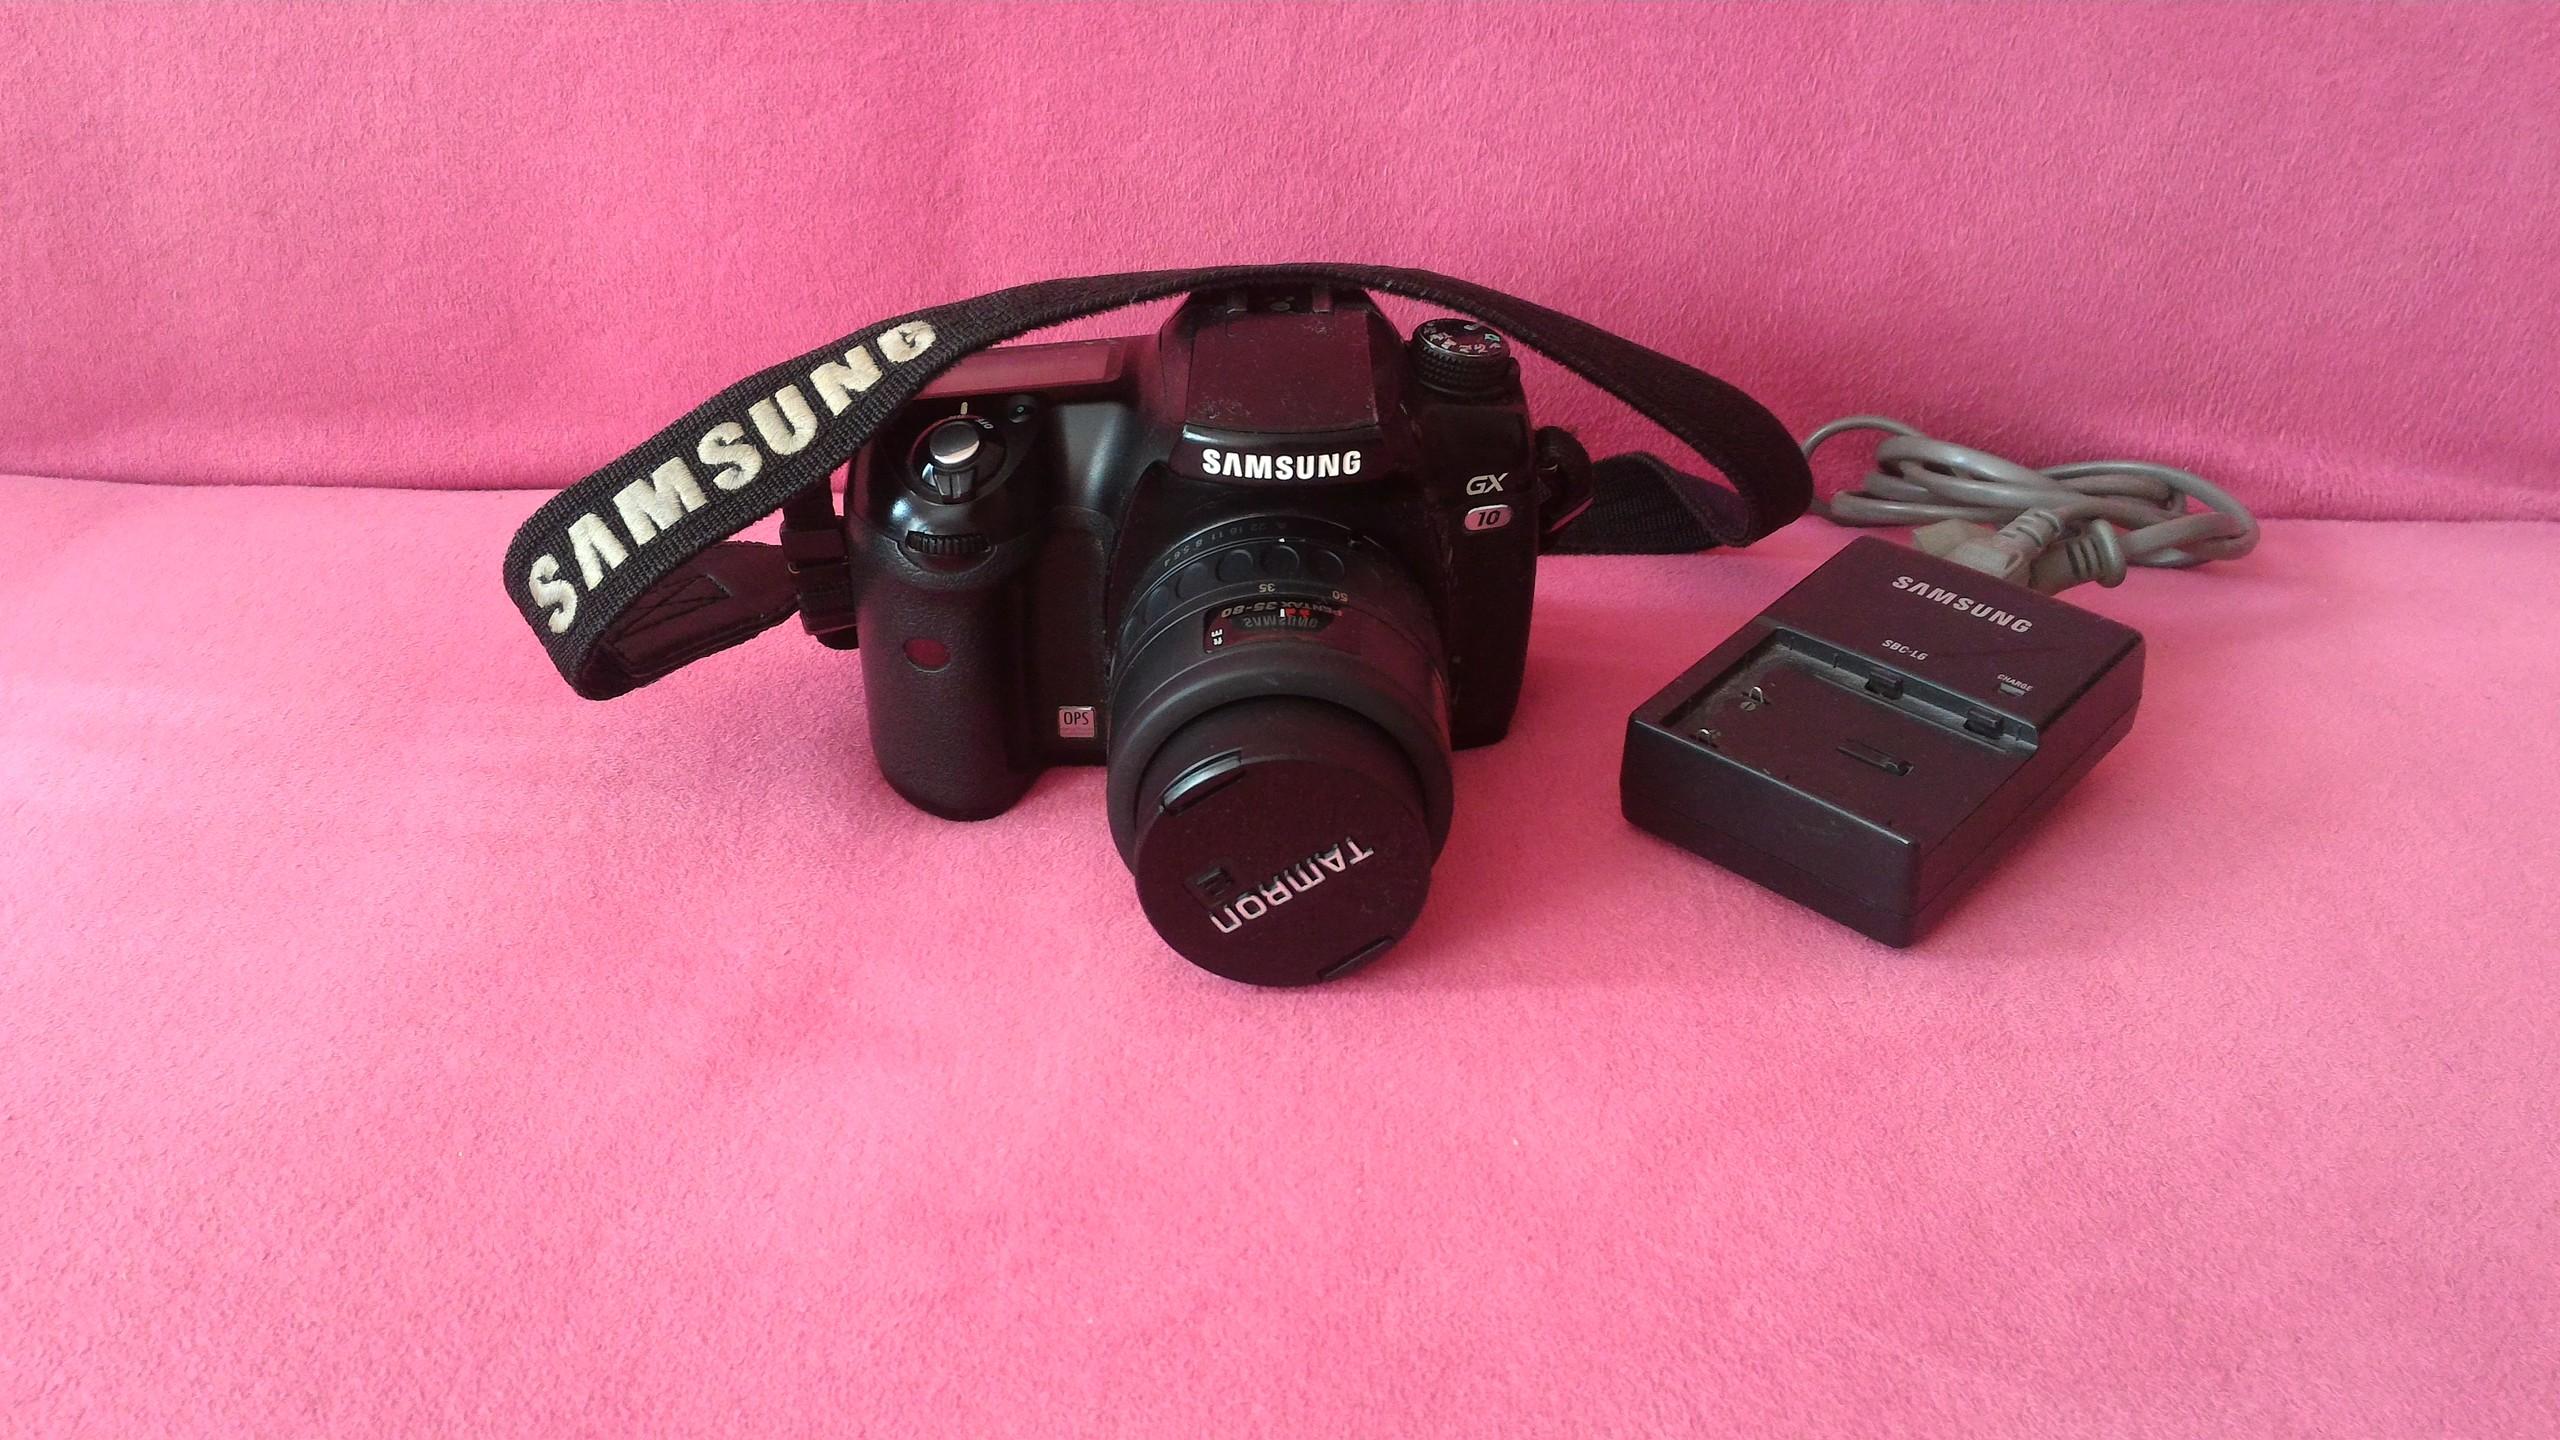 samsung gx 10 pentax fa 35 80 lens ile 500 tl